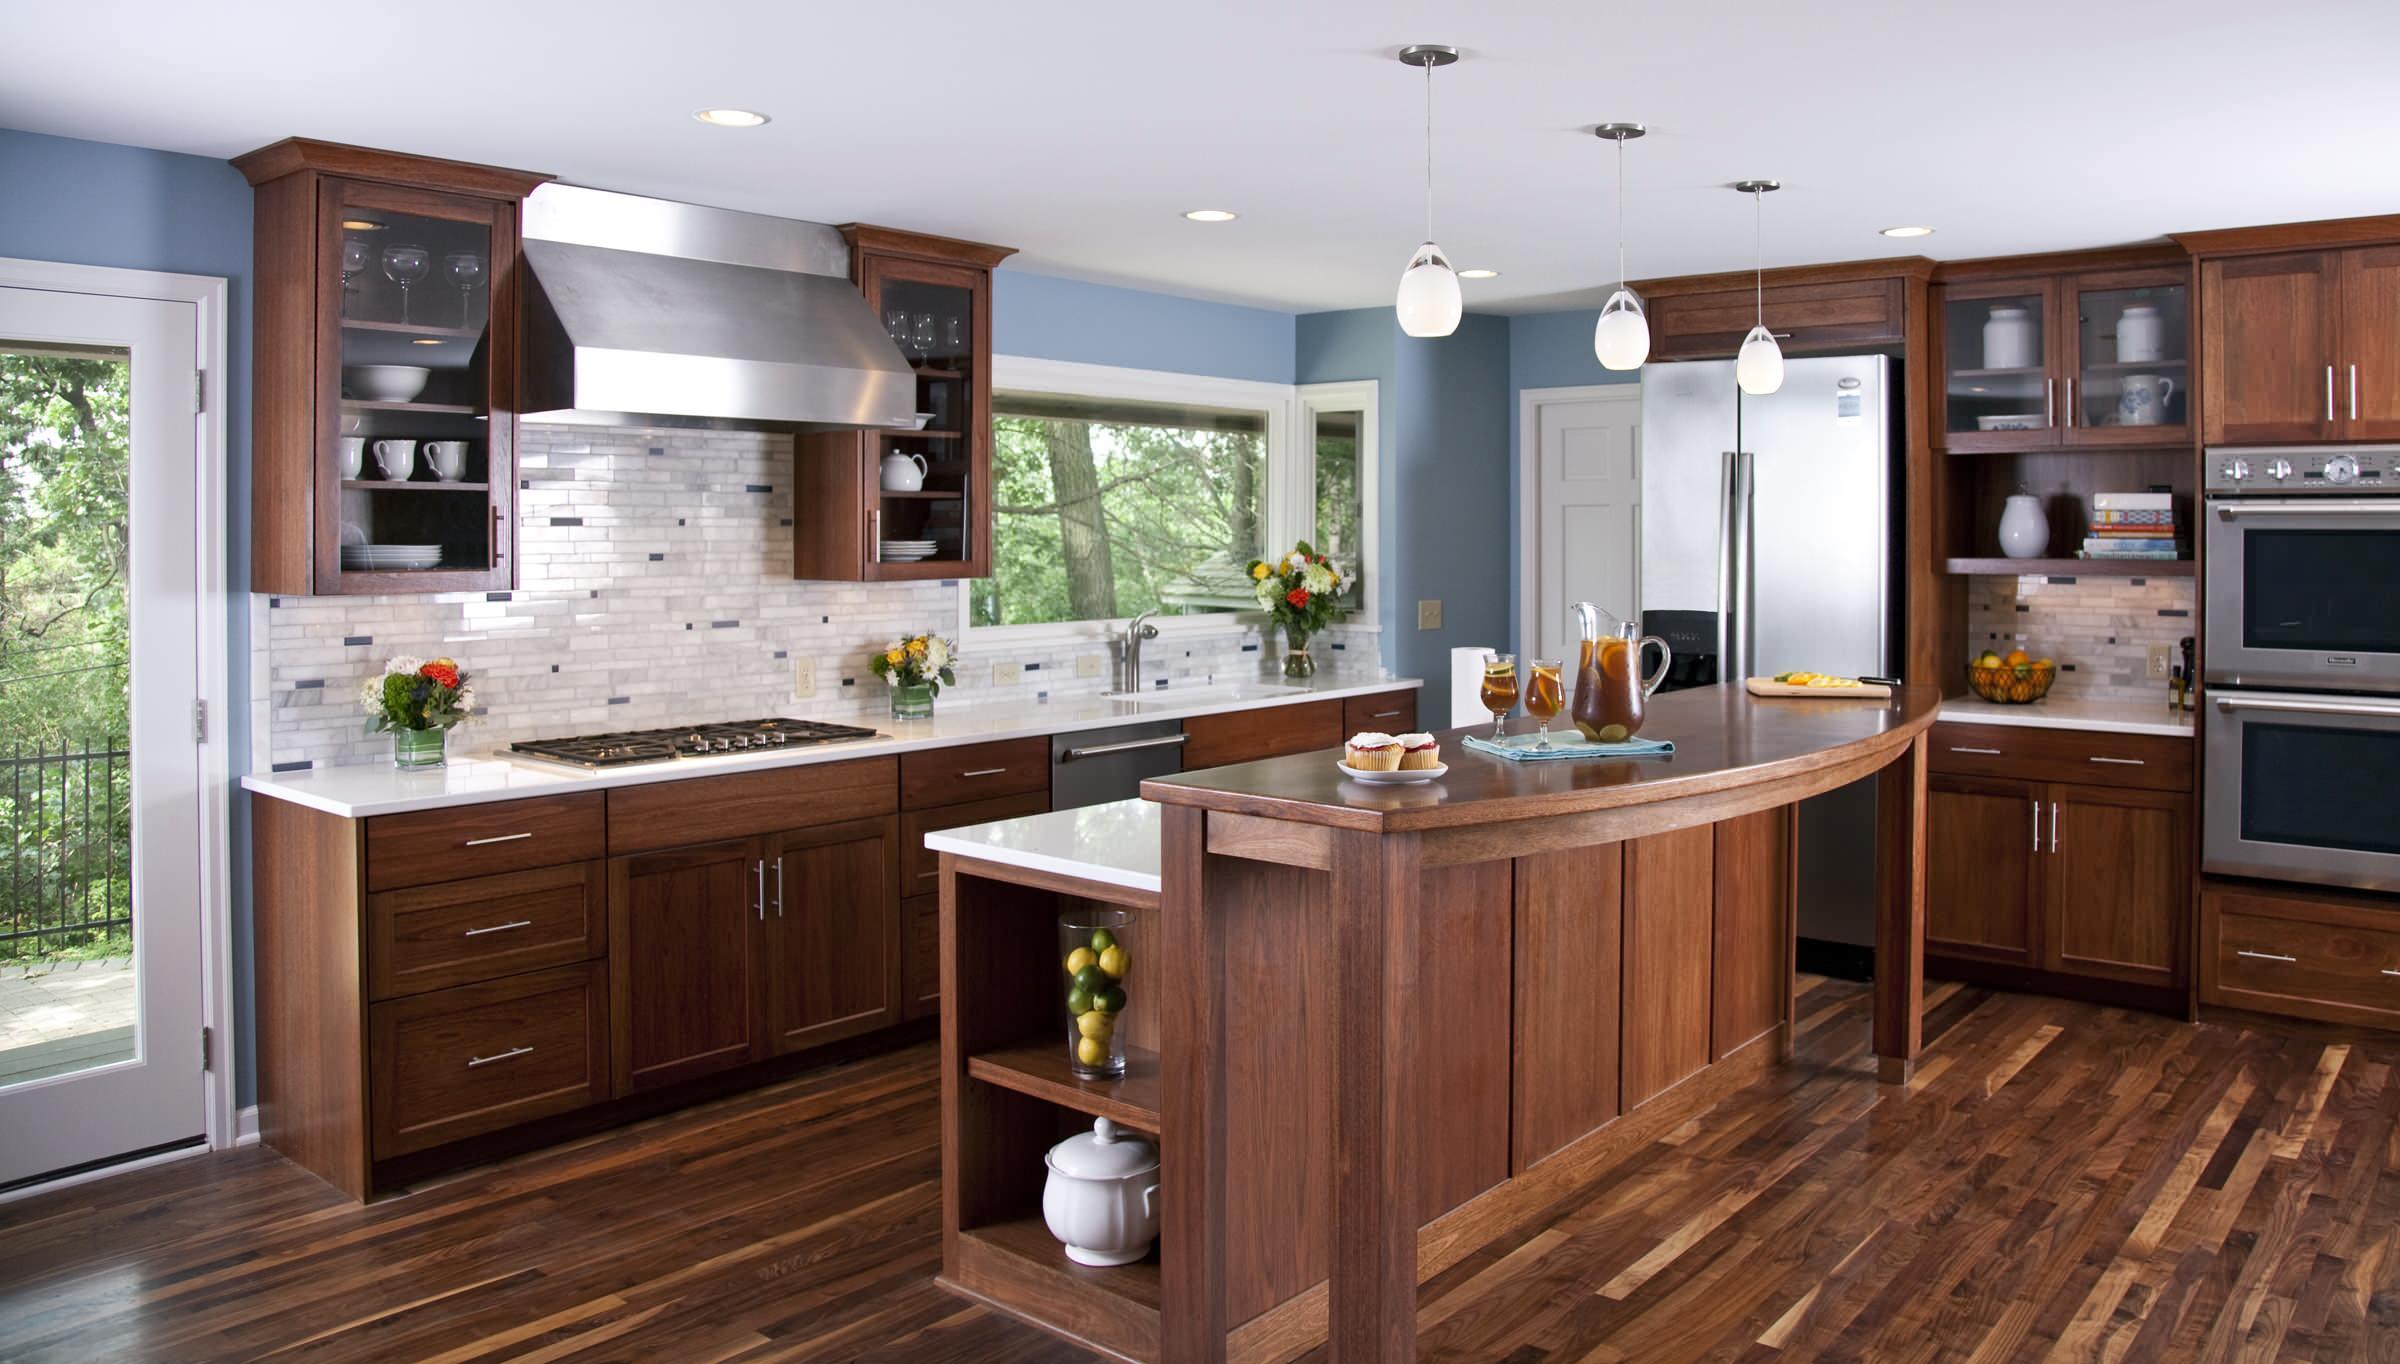 Dark Cabinets Light Countertops Contemporary Kitchen Beige Mosaic Tile Backsplash Dark Wood Drawers